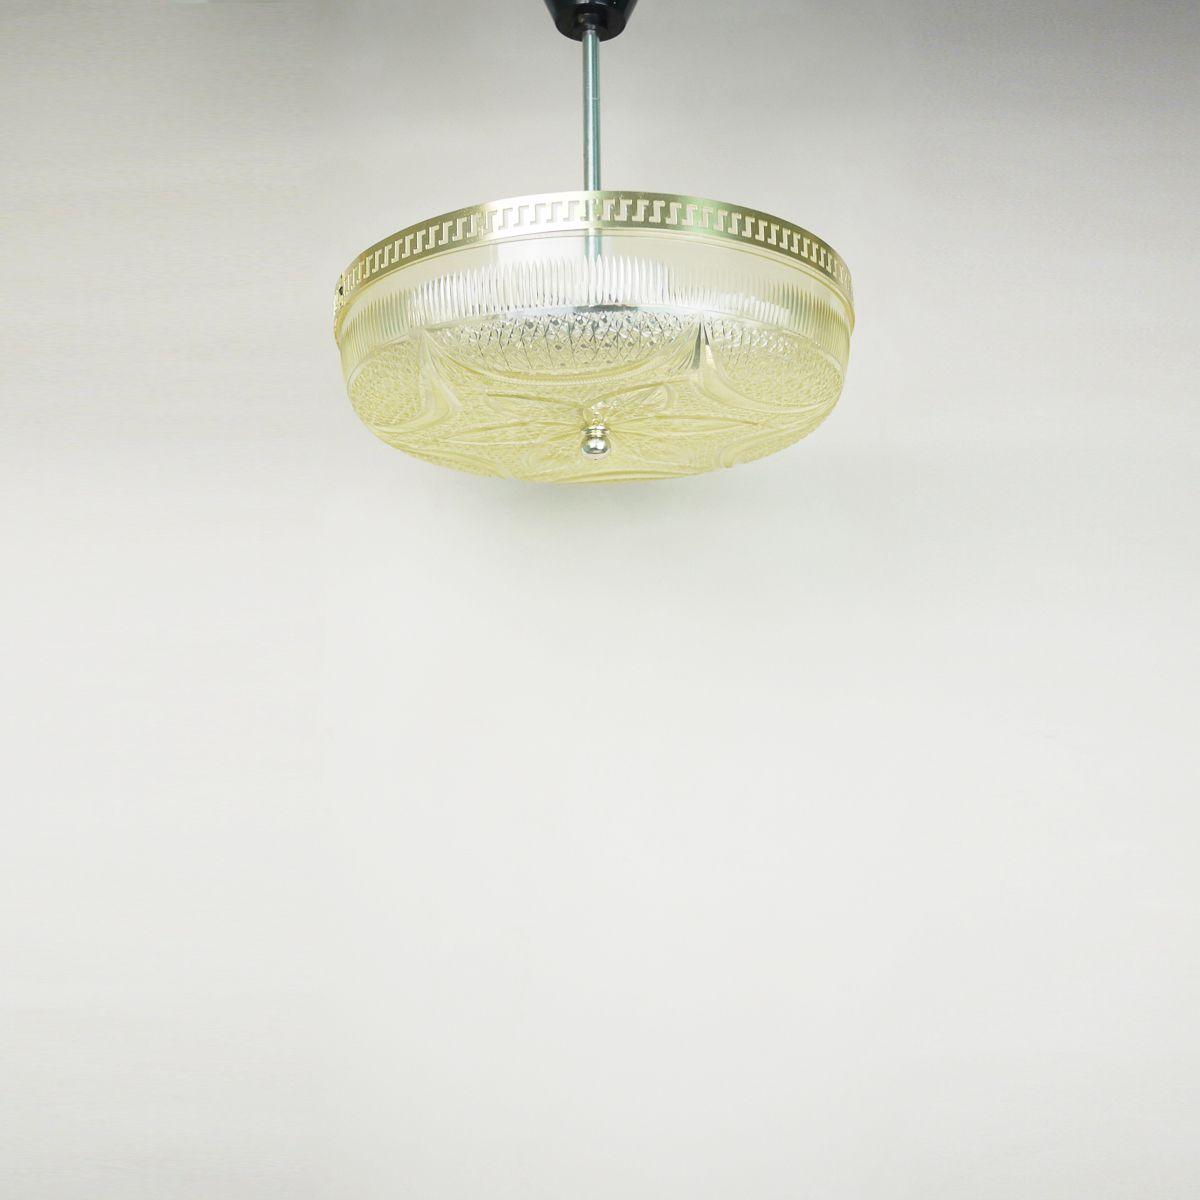 Hängelampe aus Acrylglas in Kristall-Optik, 1970er